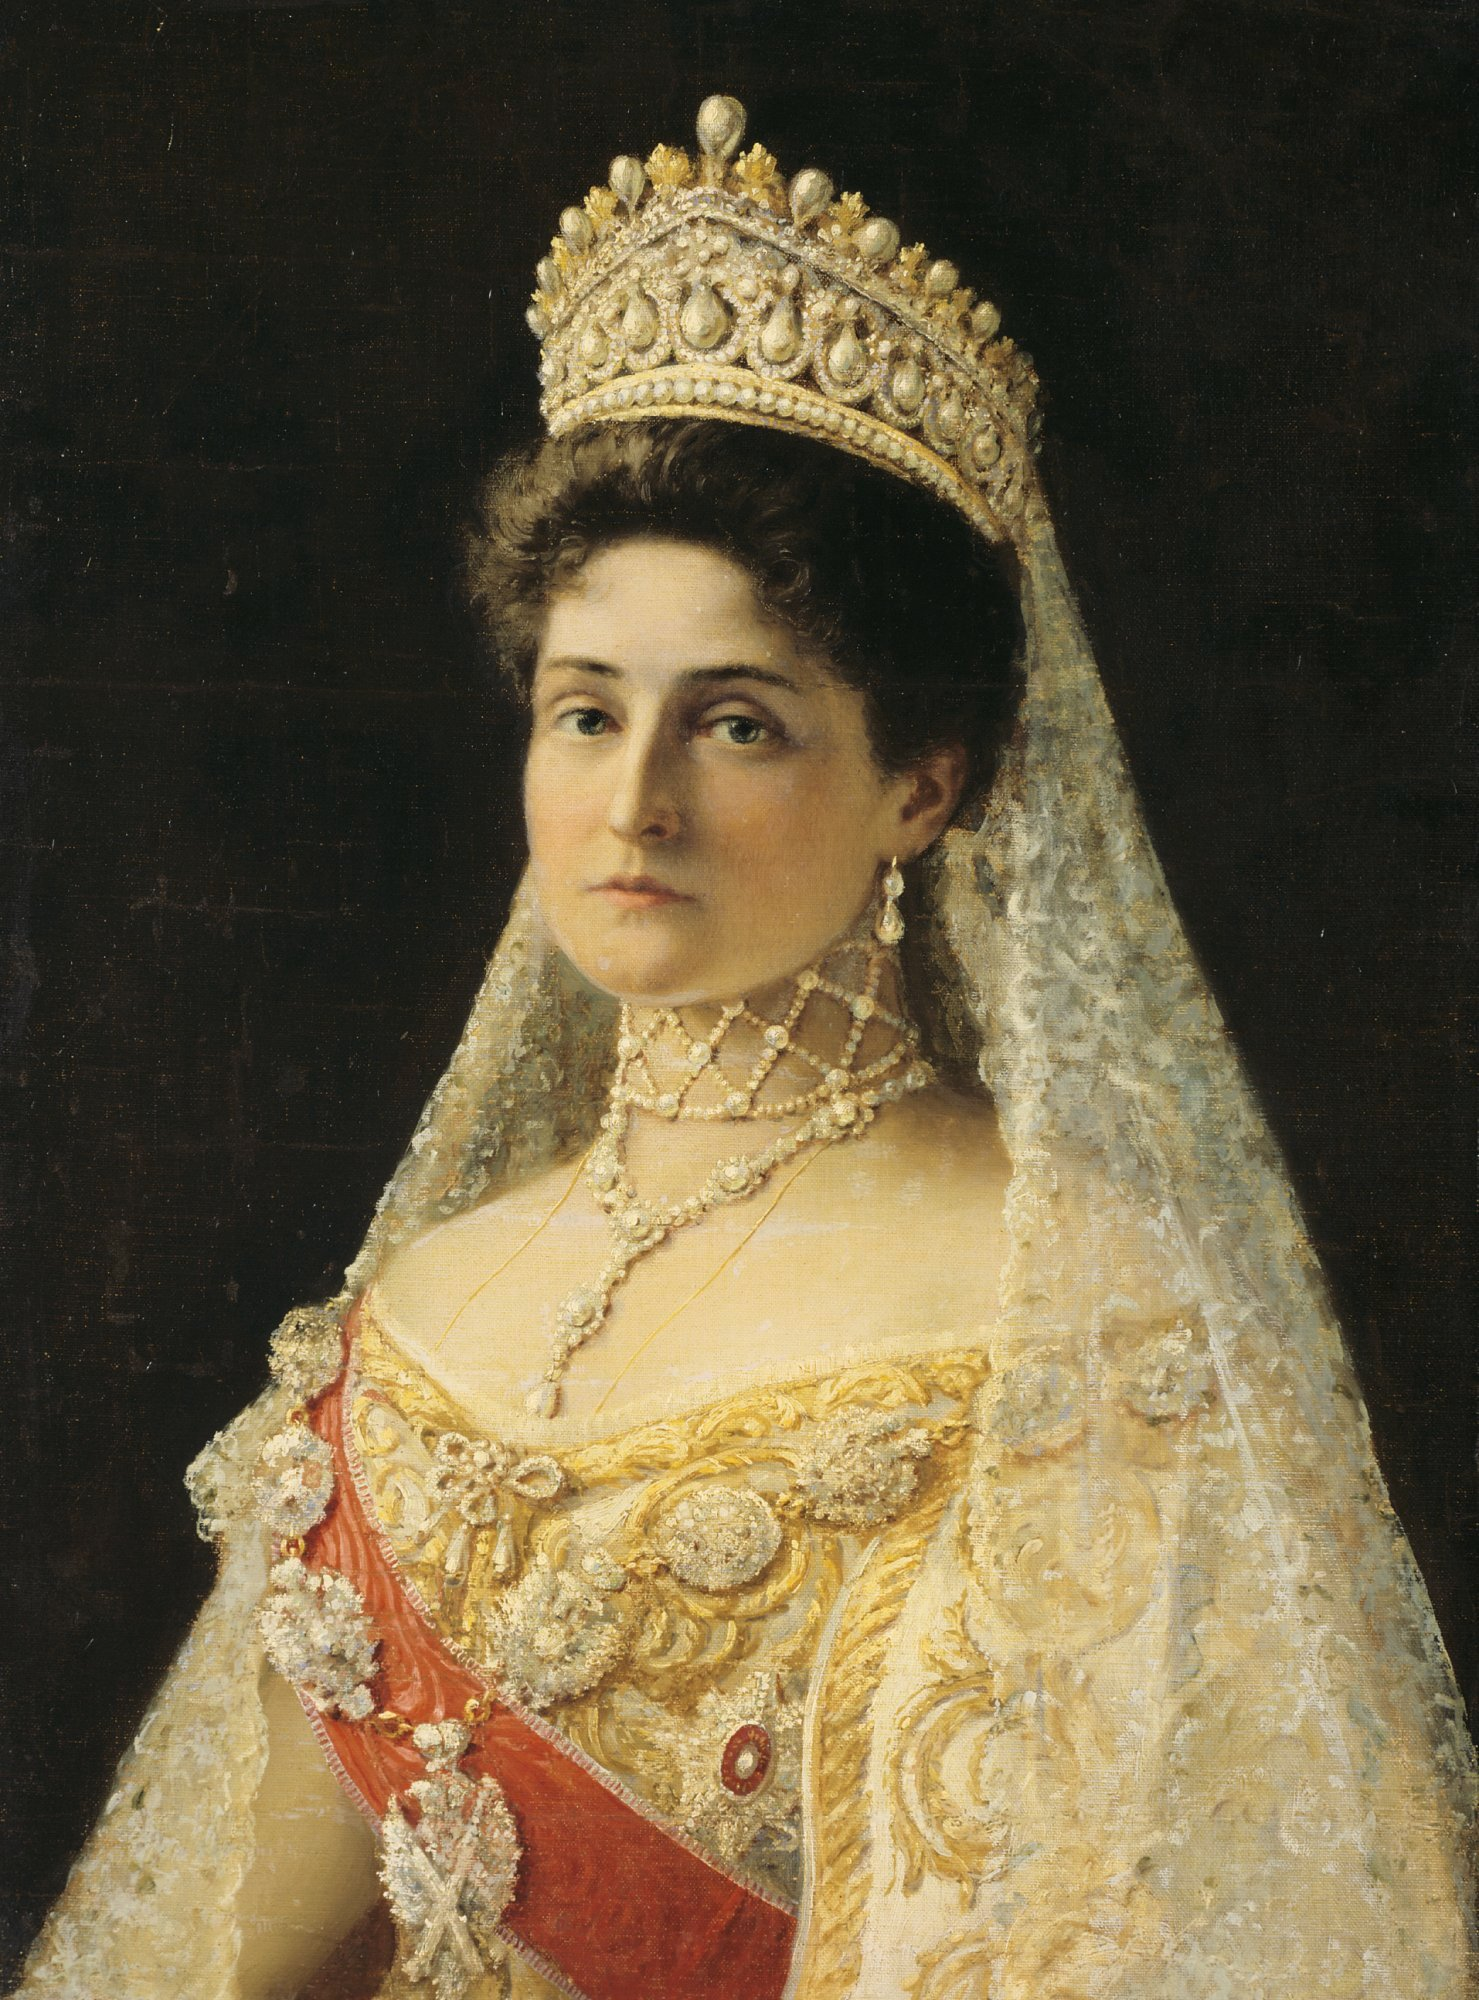 Portrait of Empress Alexandra Feodorovna by an unknown artist, ca. 1906-07